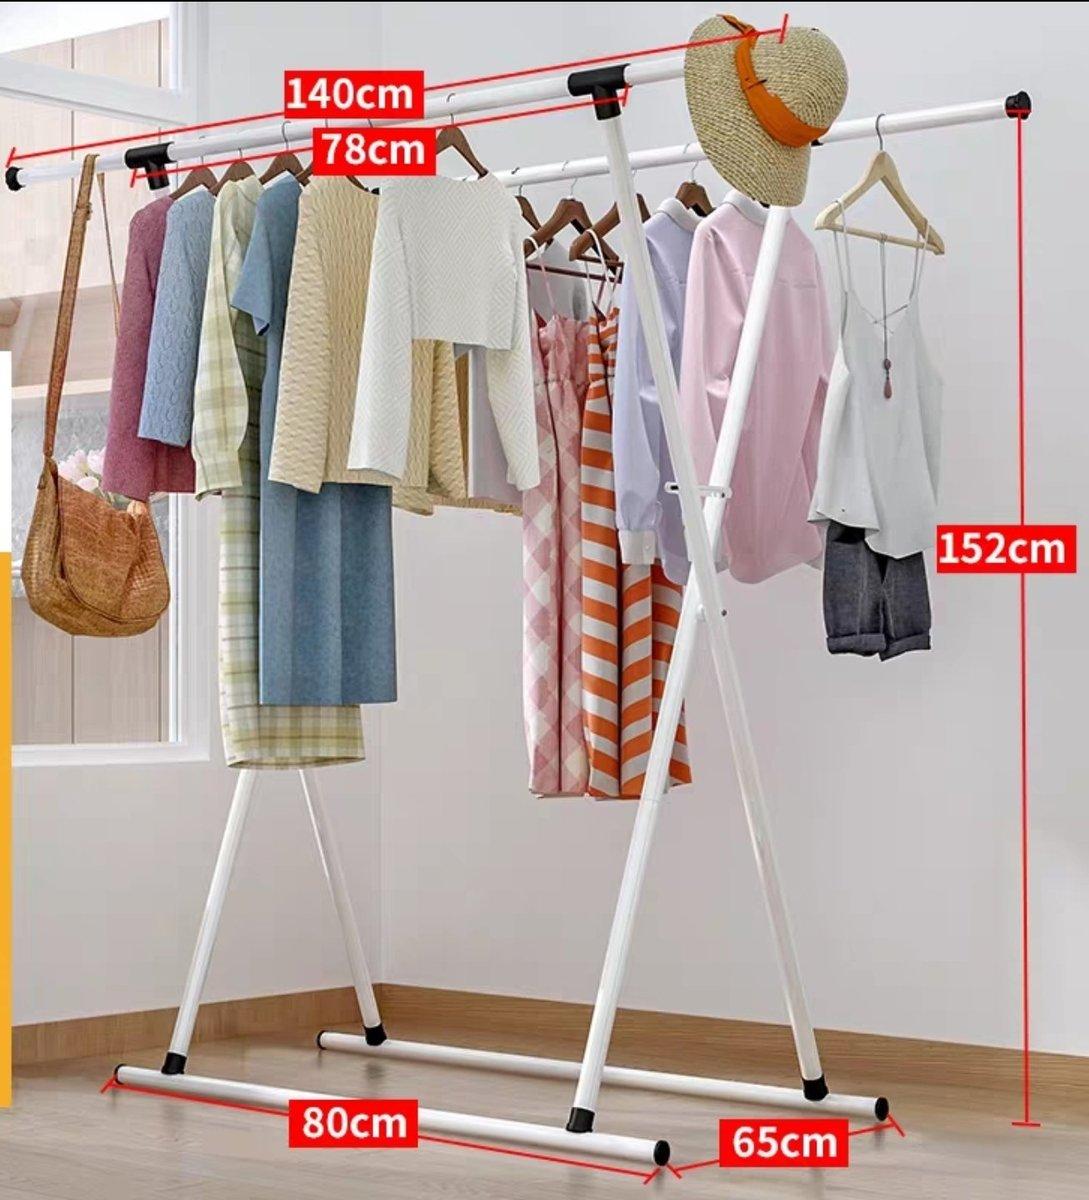 Retractable Double Bar Hanger - F-White (X54)